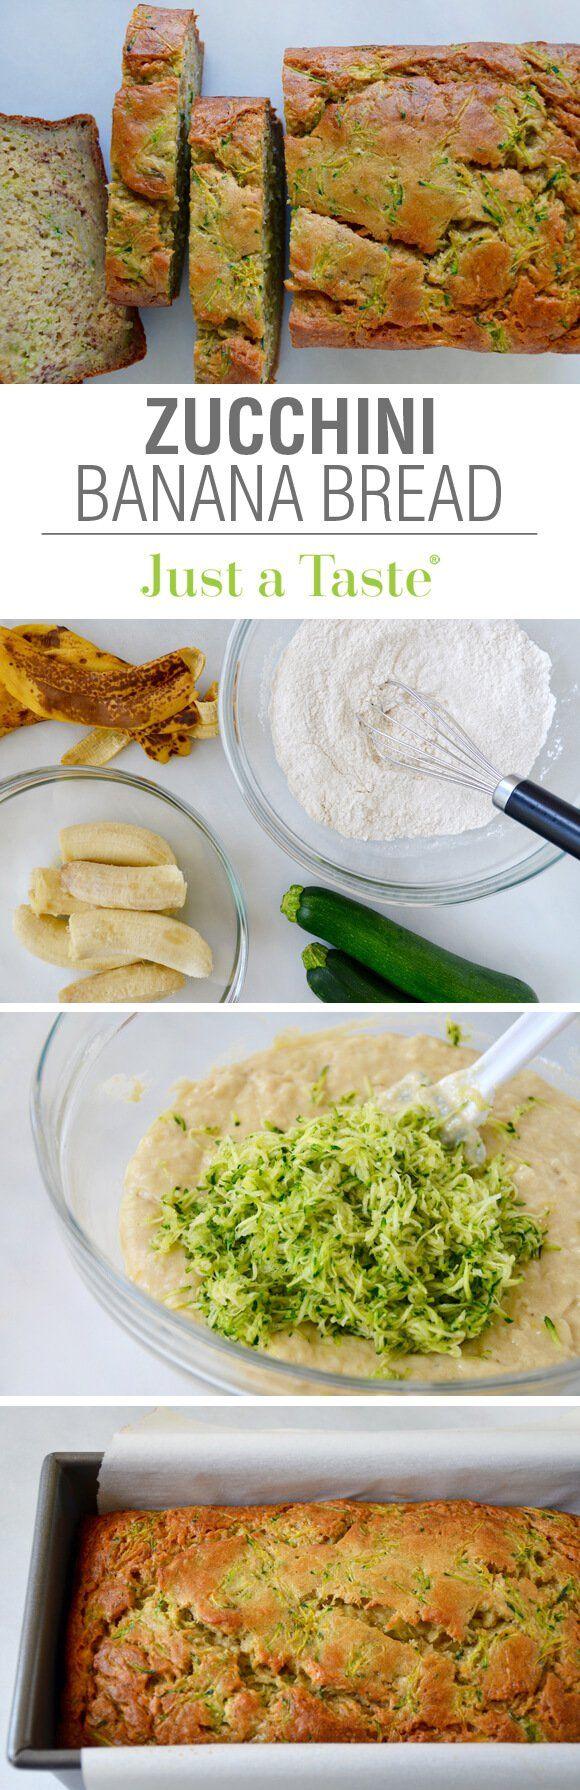 Use oat flour instead of AP flour, Greek yogurt instead of buttermilk, applesauce instead of sugar, and oil instead of butter. YUM!